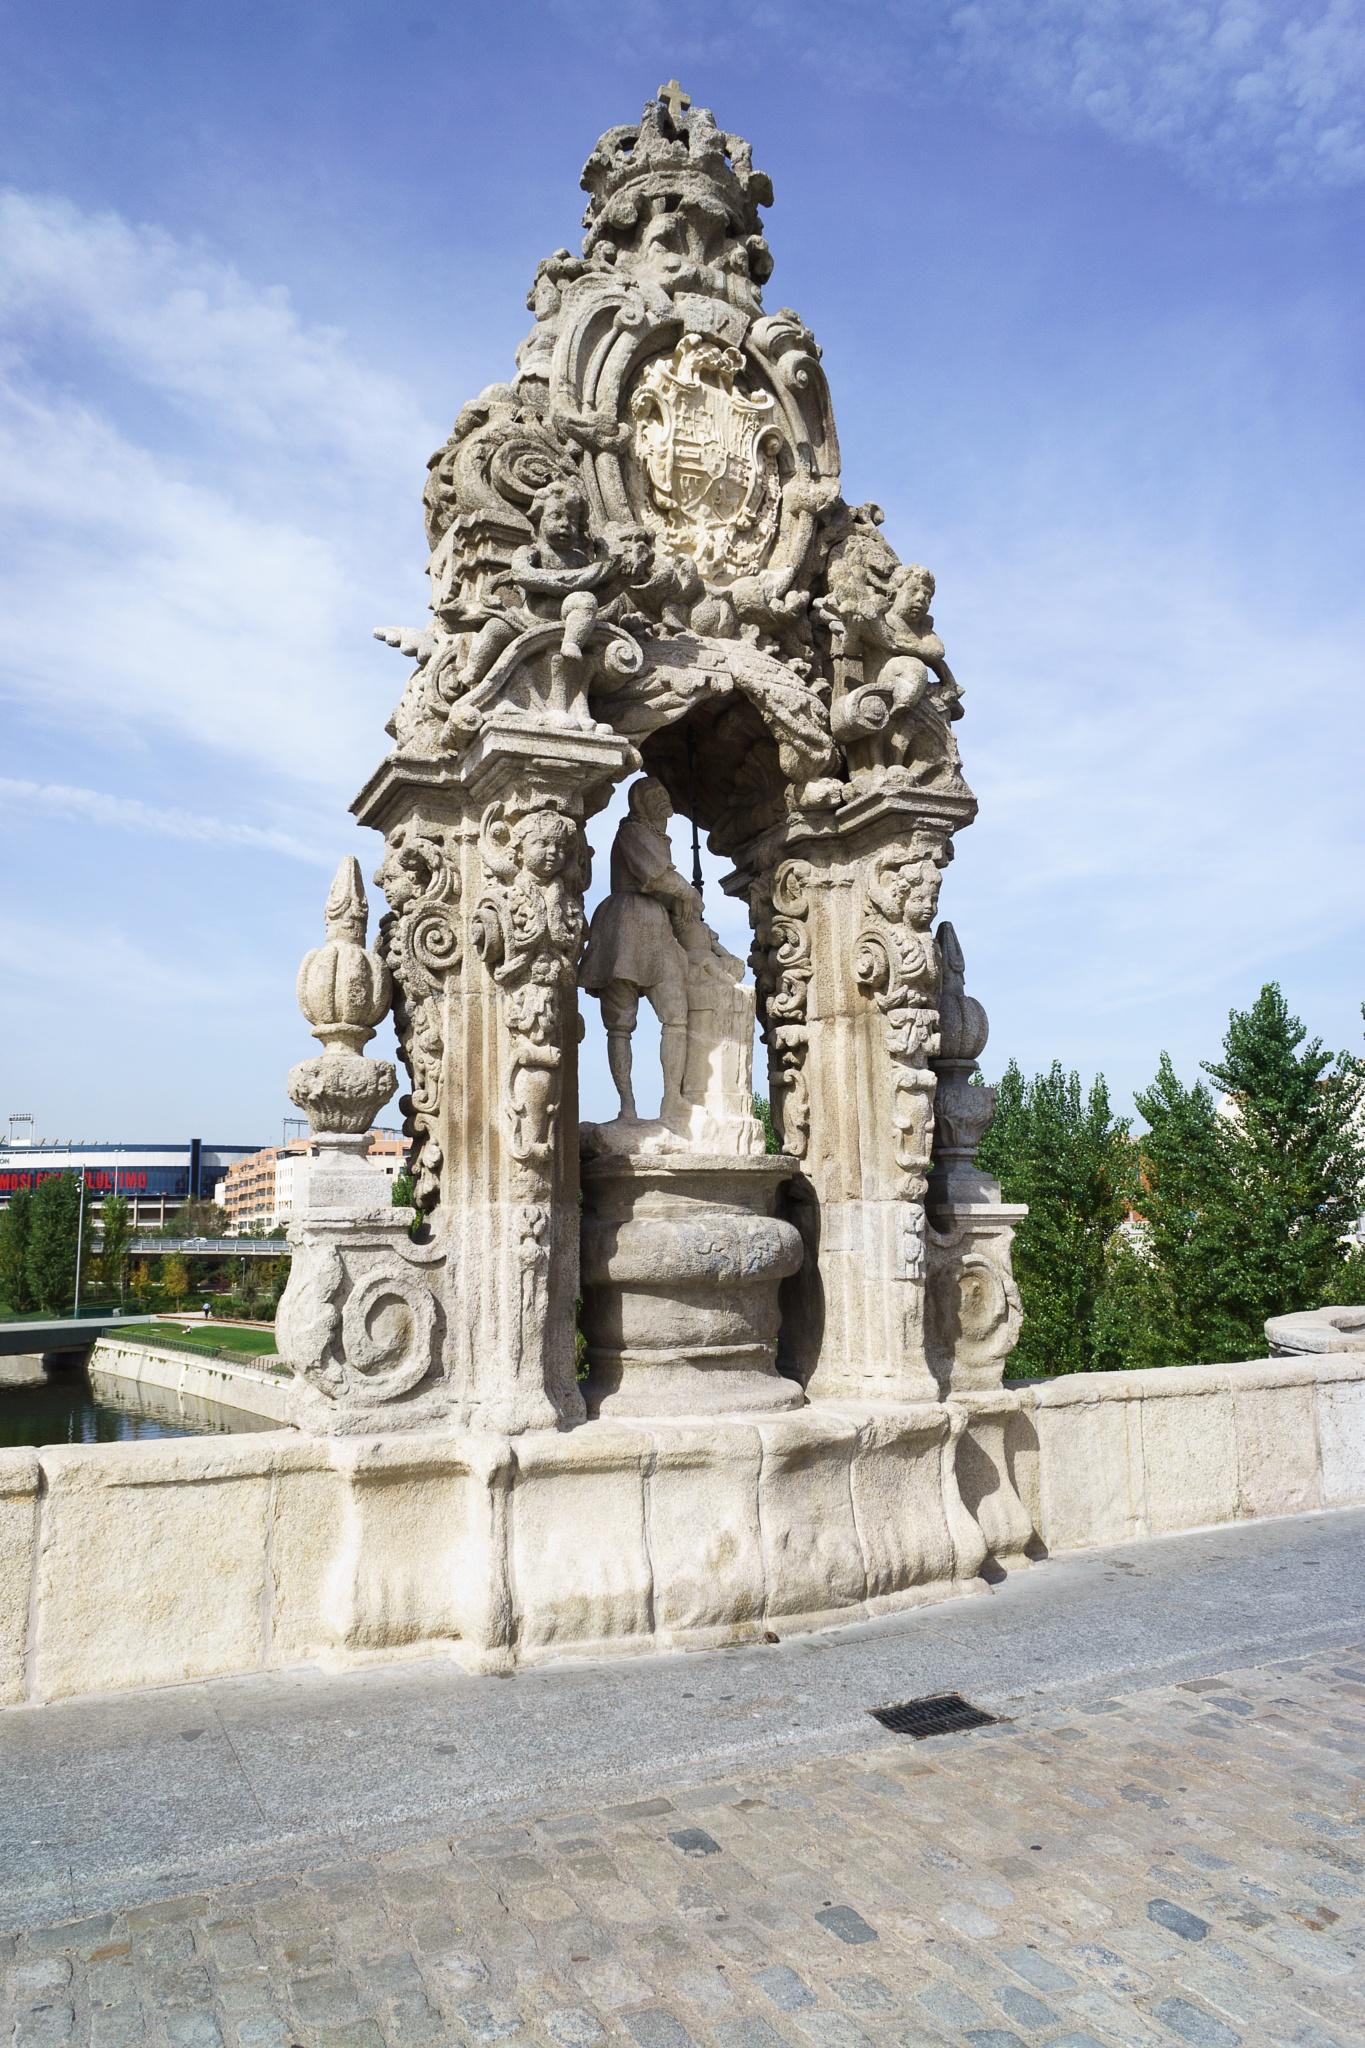 Patron saint of Madrid by Jose Manuel Navarro